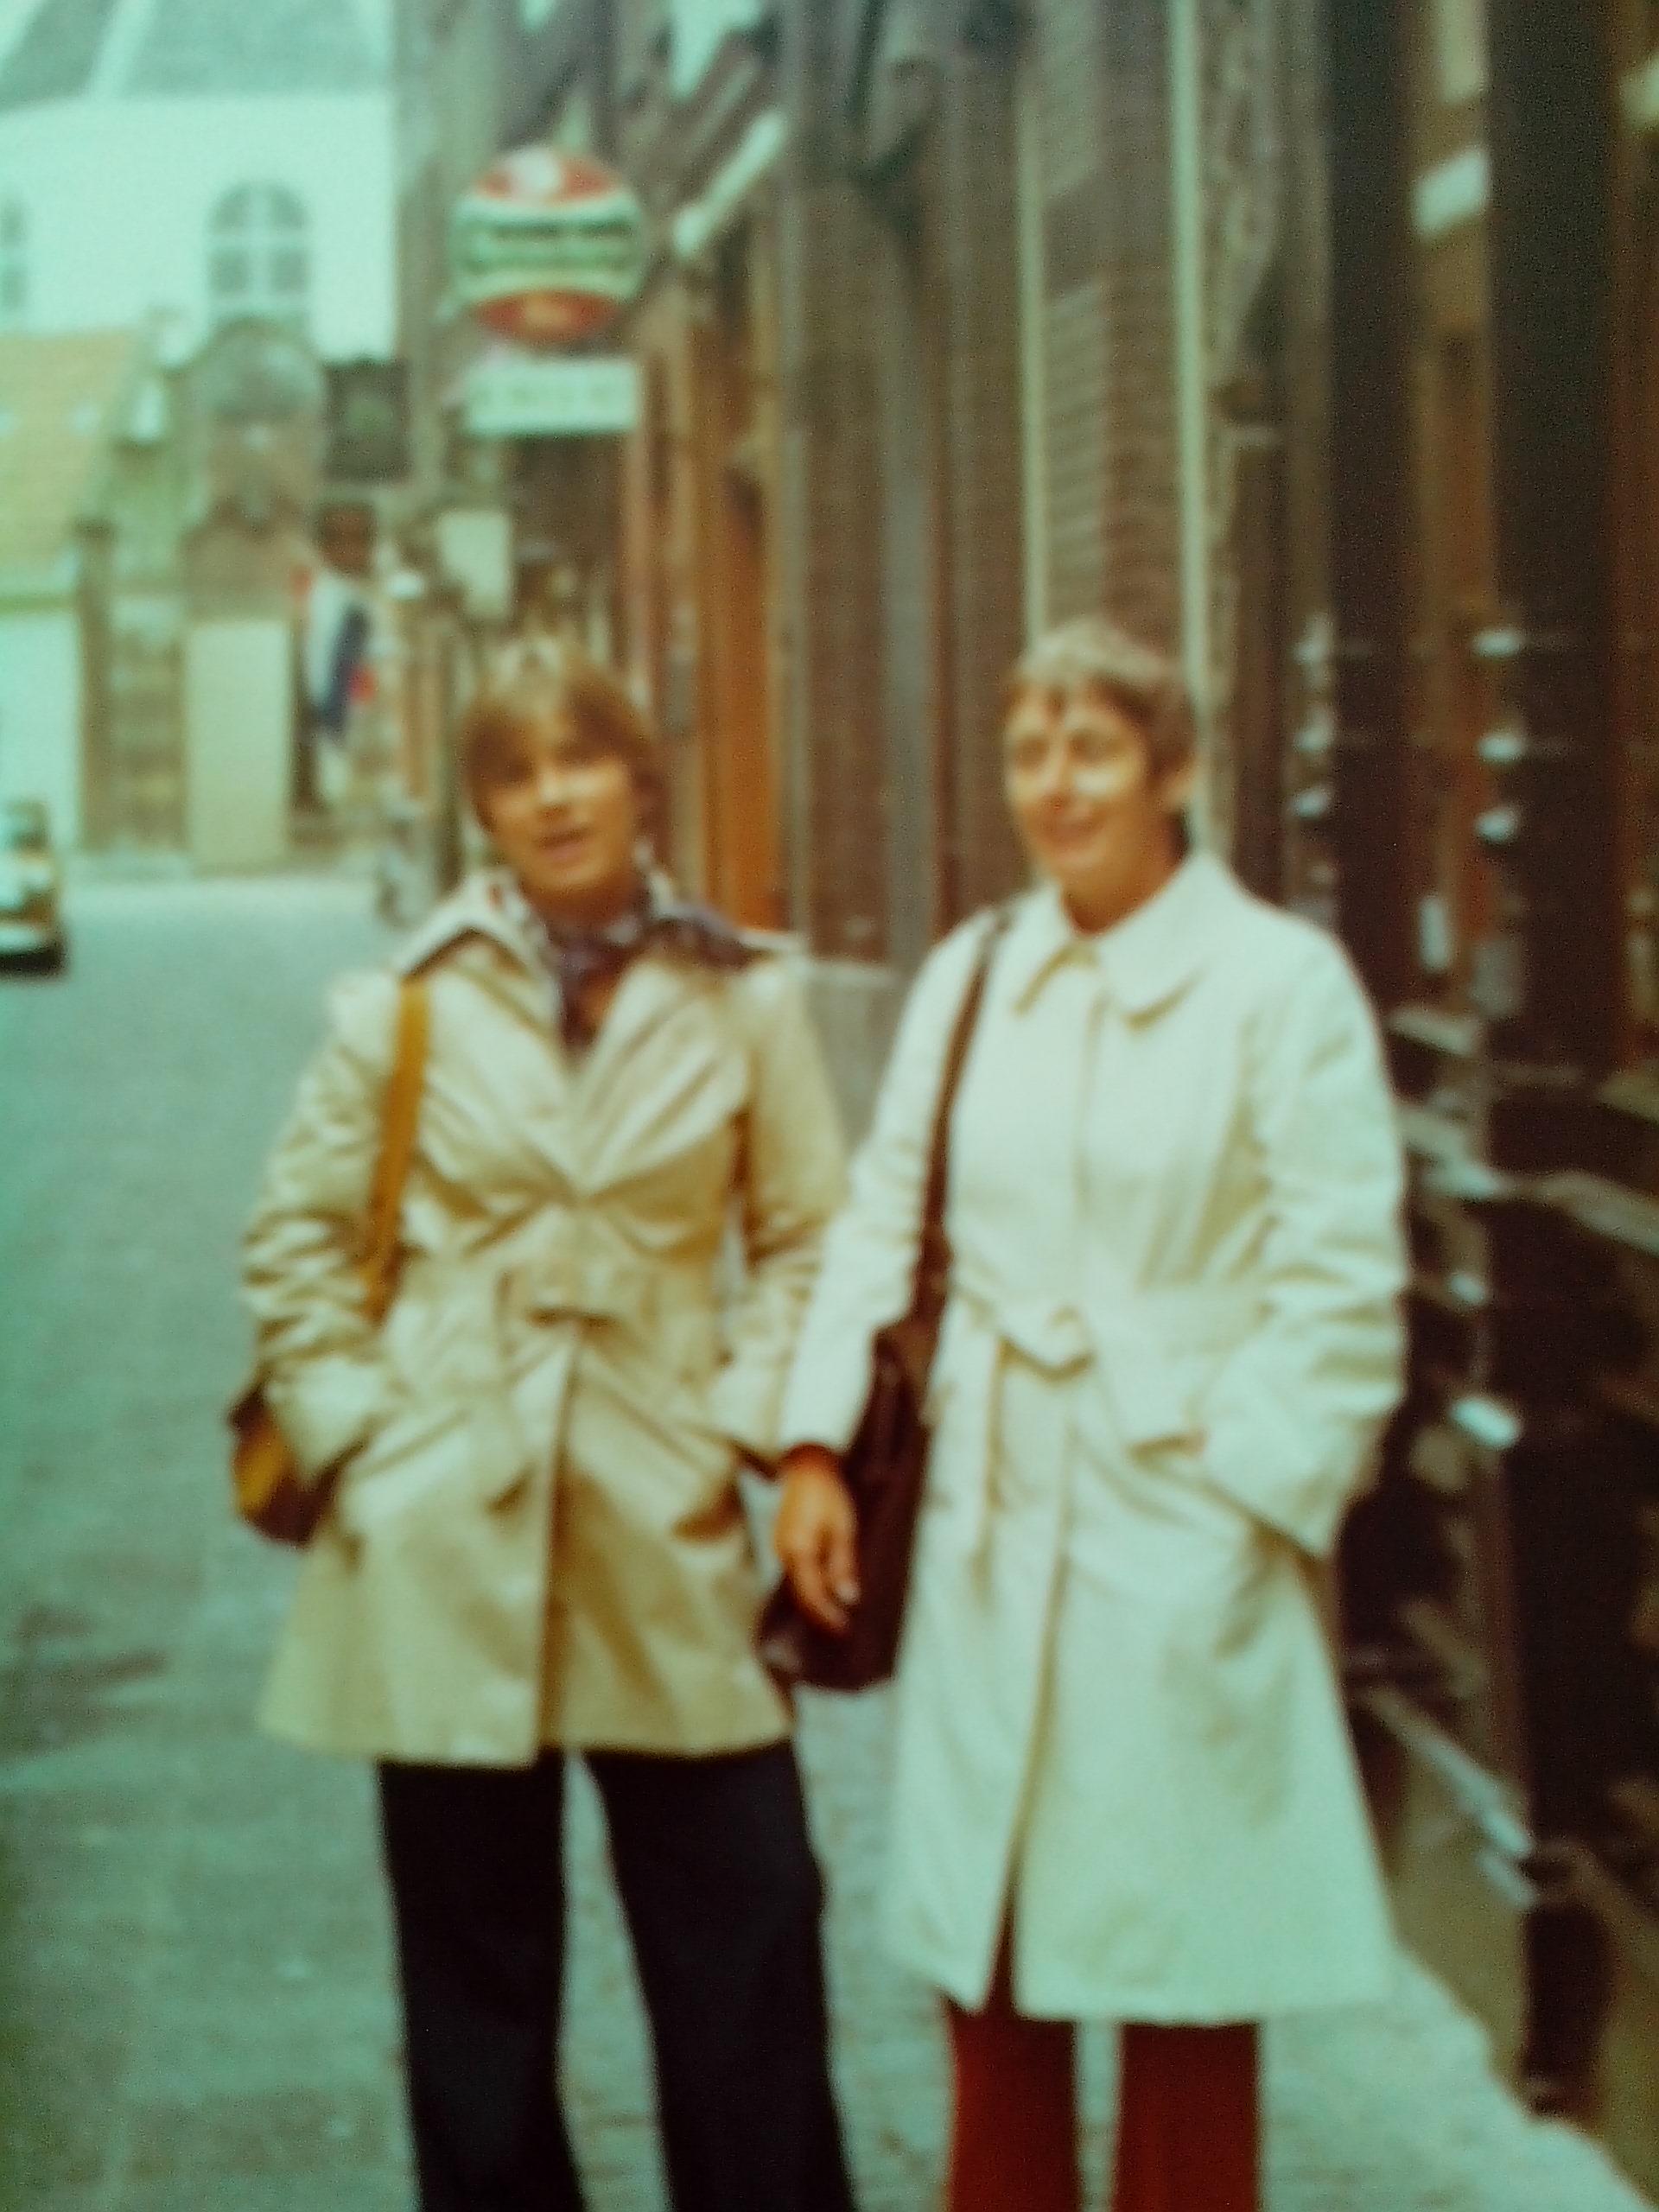 Amsterdam, June 1976